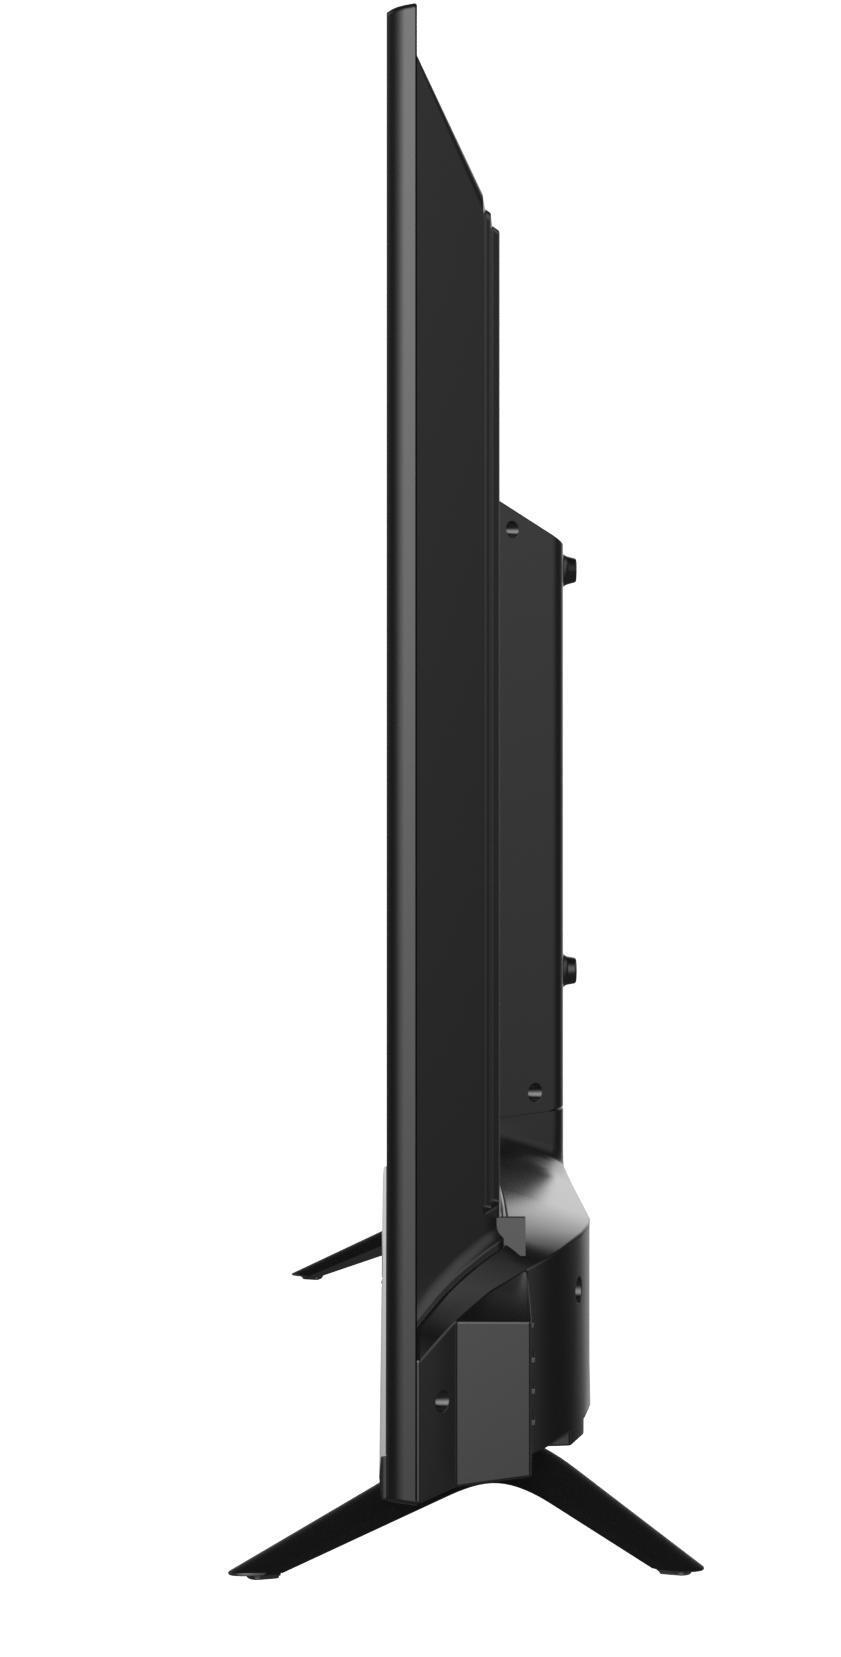 Smart телевізор Ergo 43DUS6000 - фото 8.